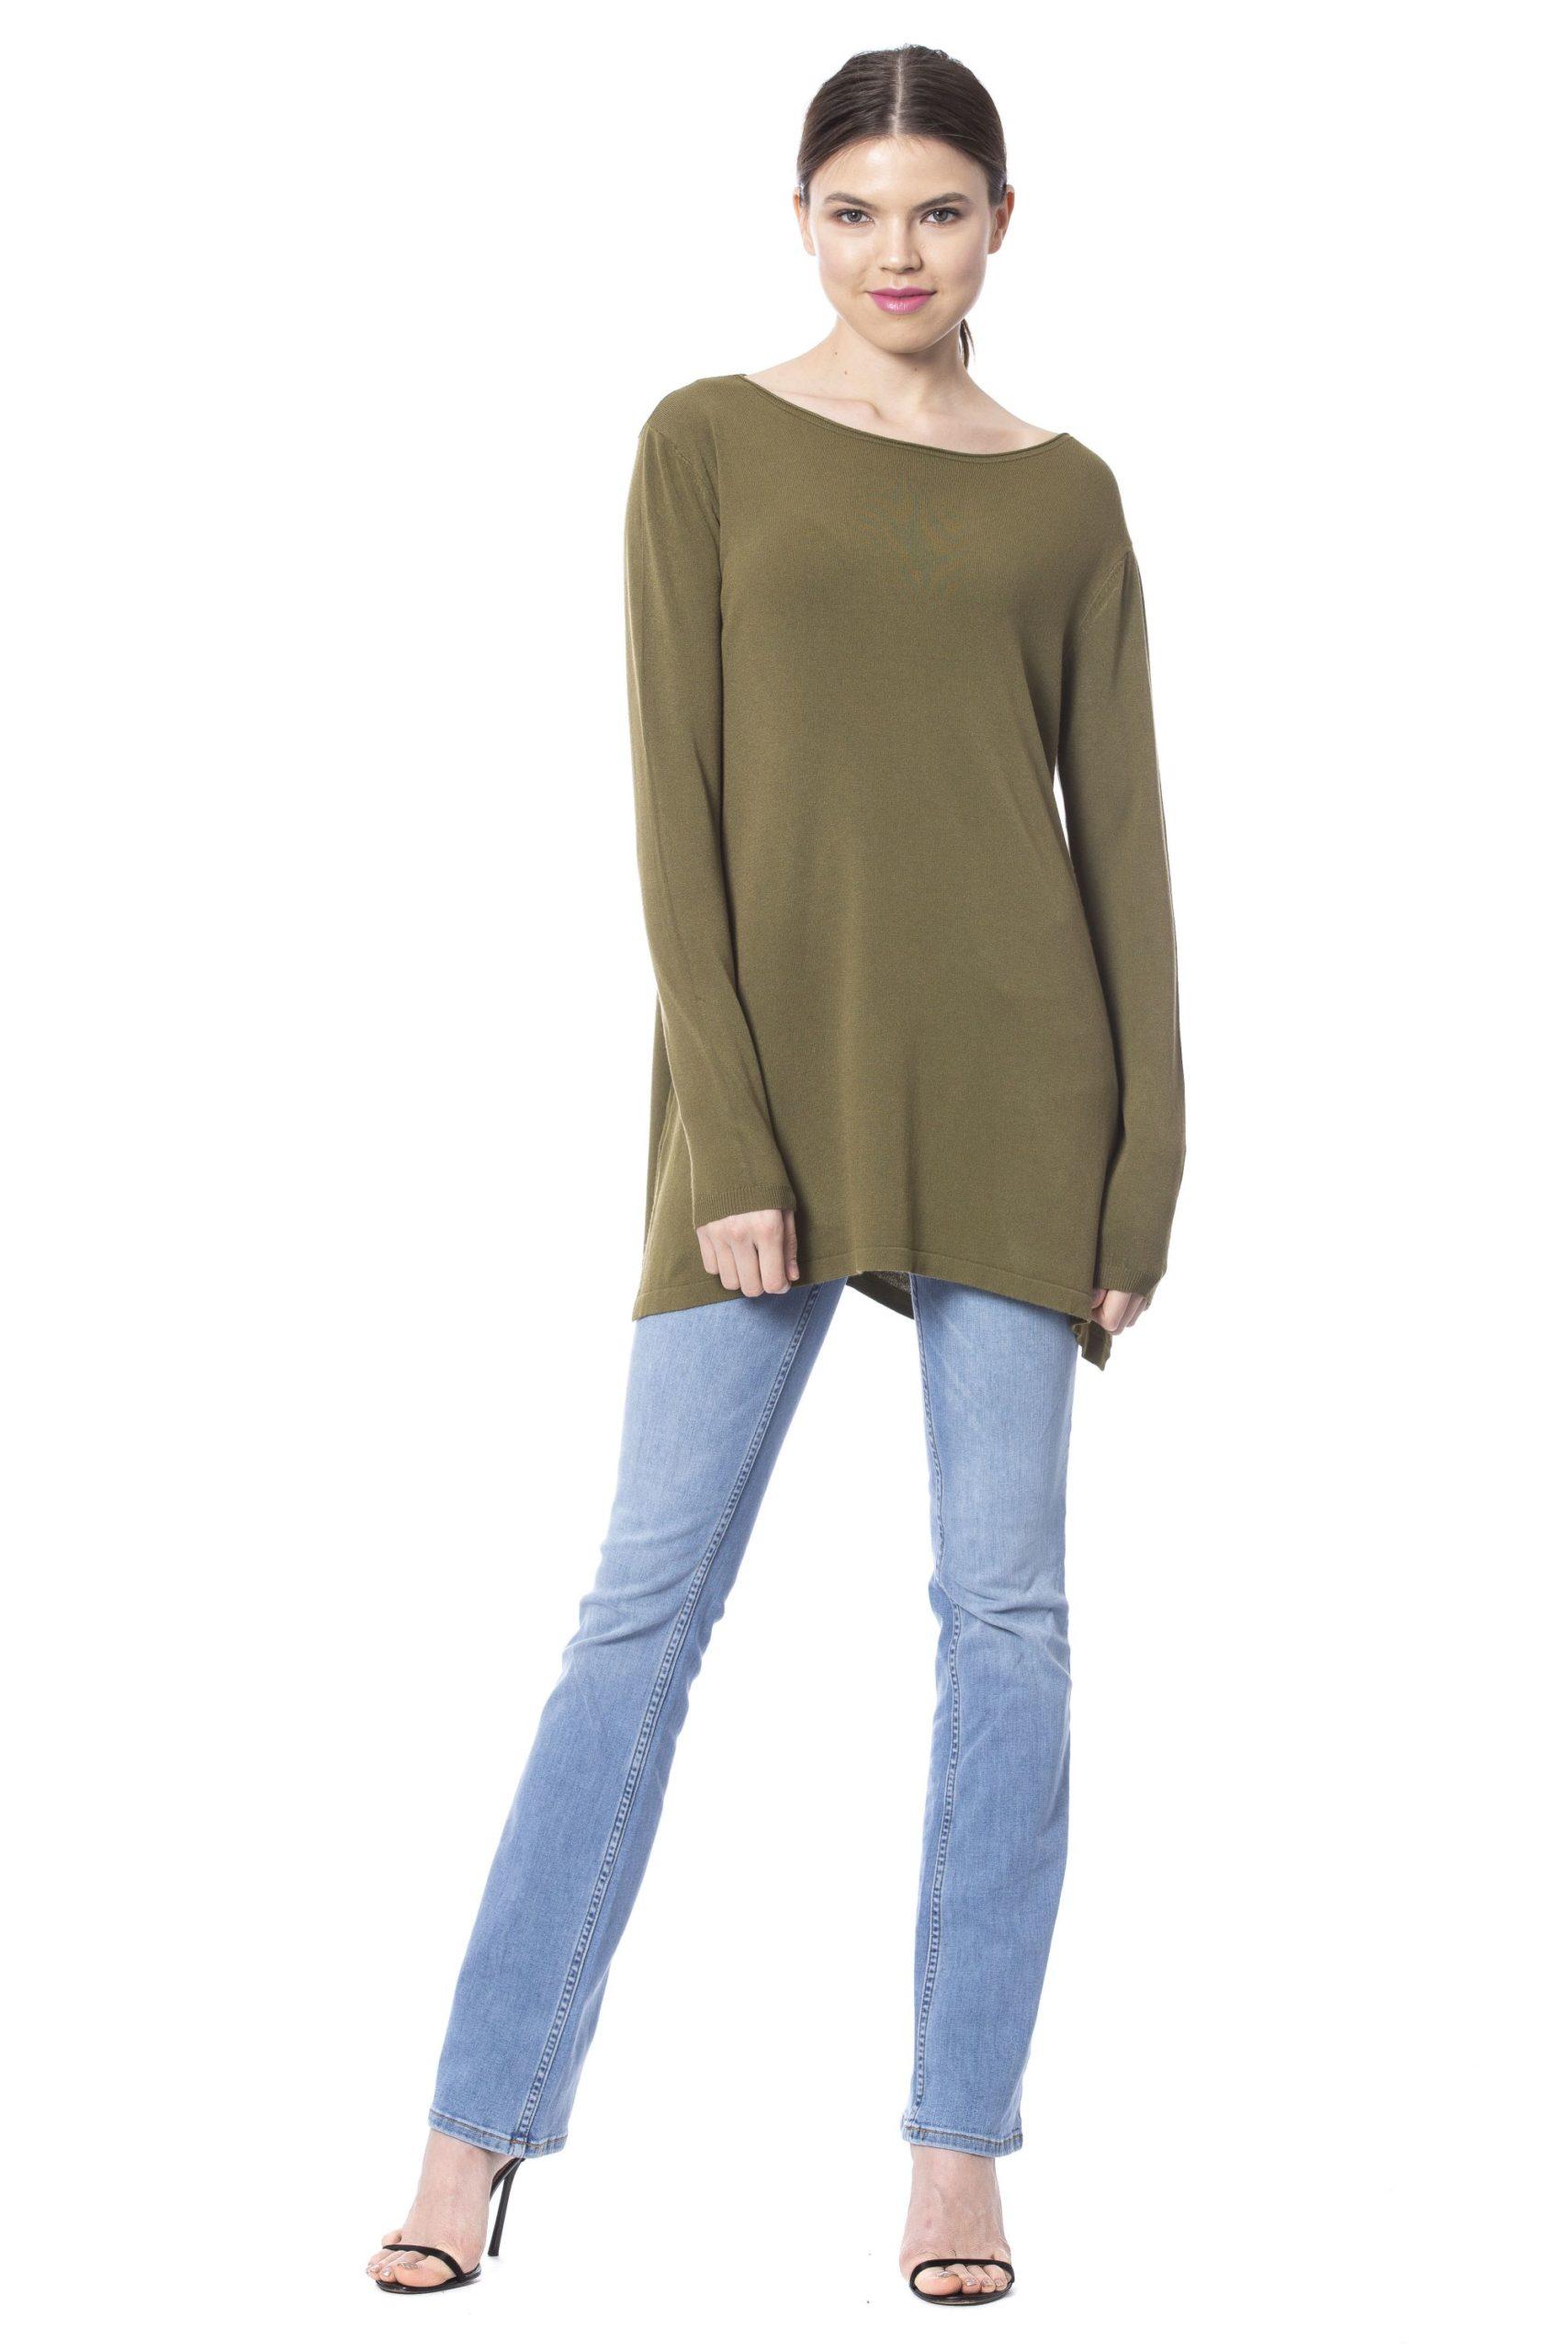 Silvian Heach Women's Sweater Green SI996672 - S